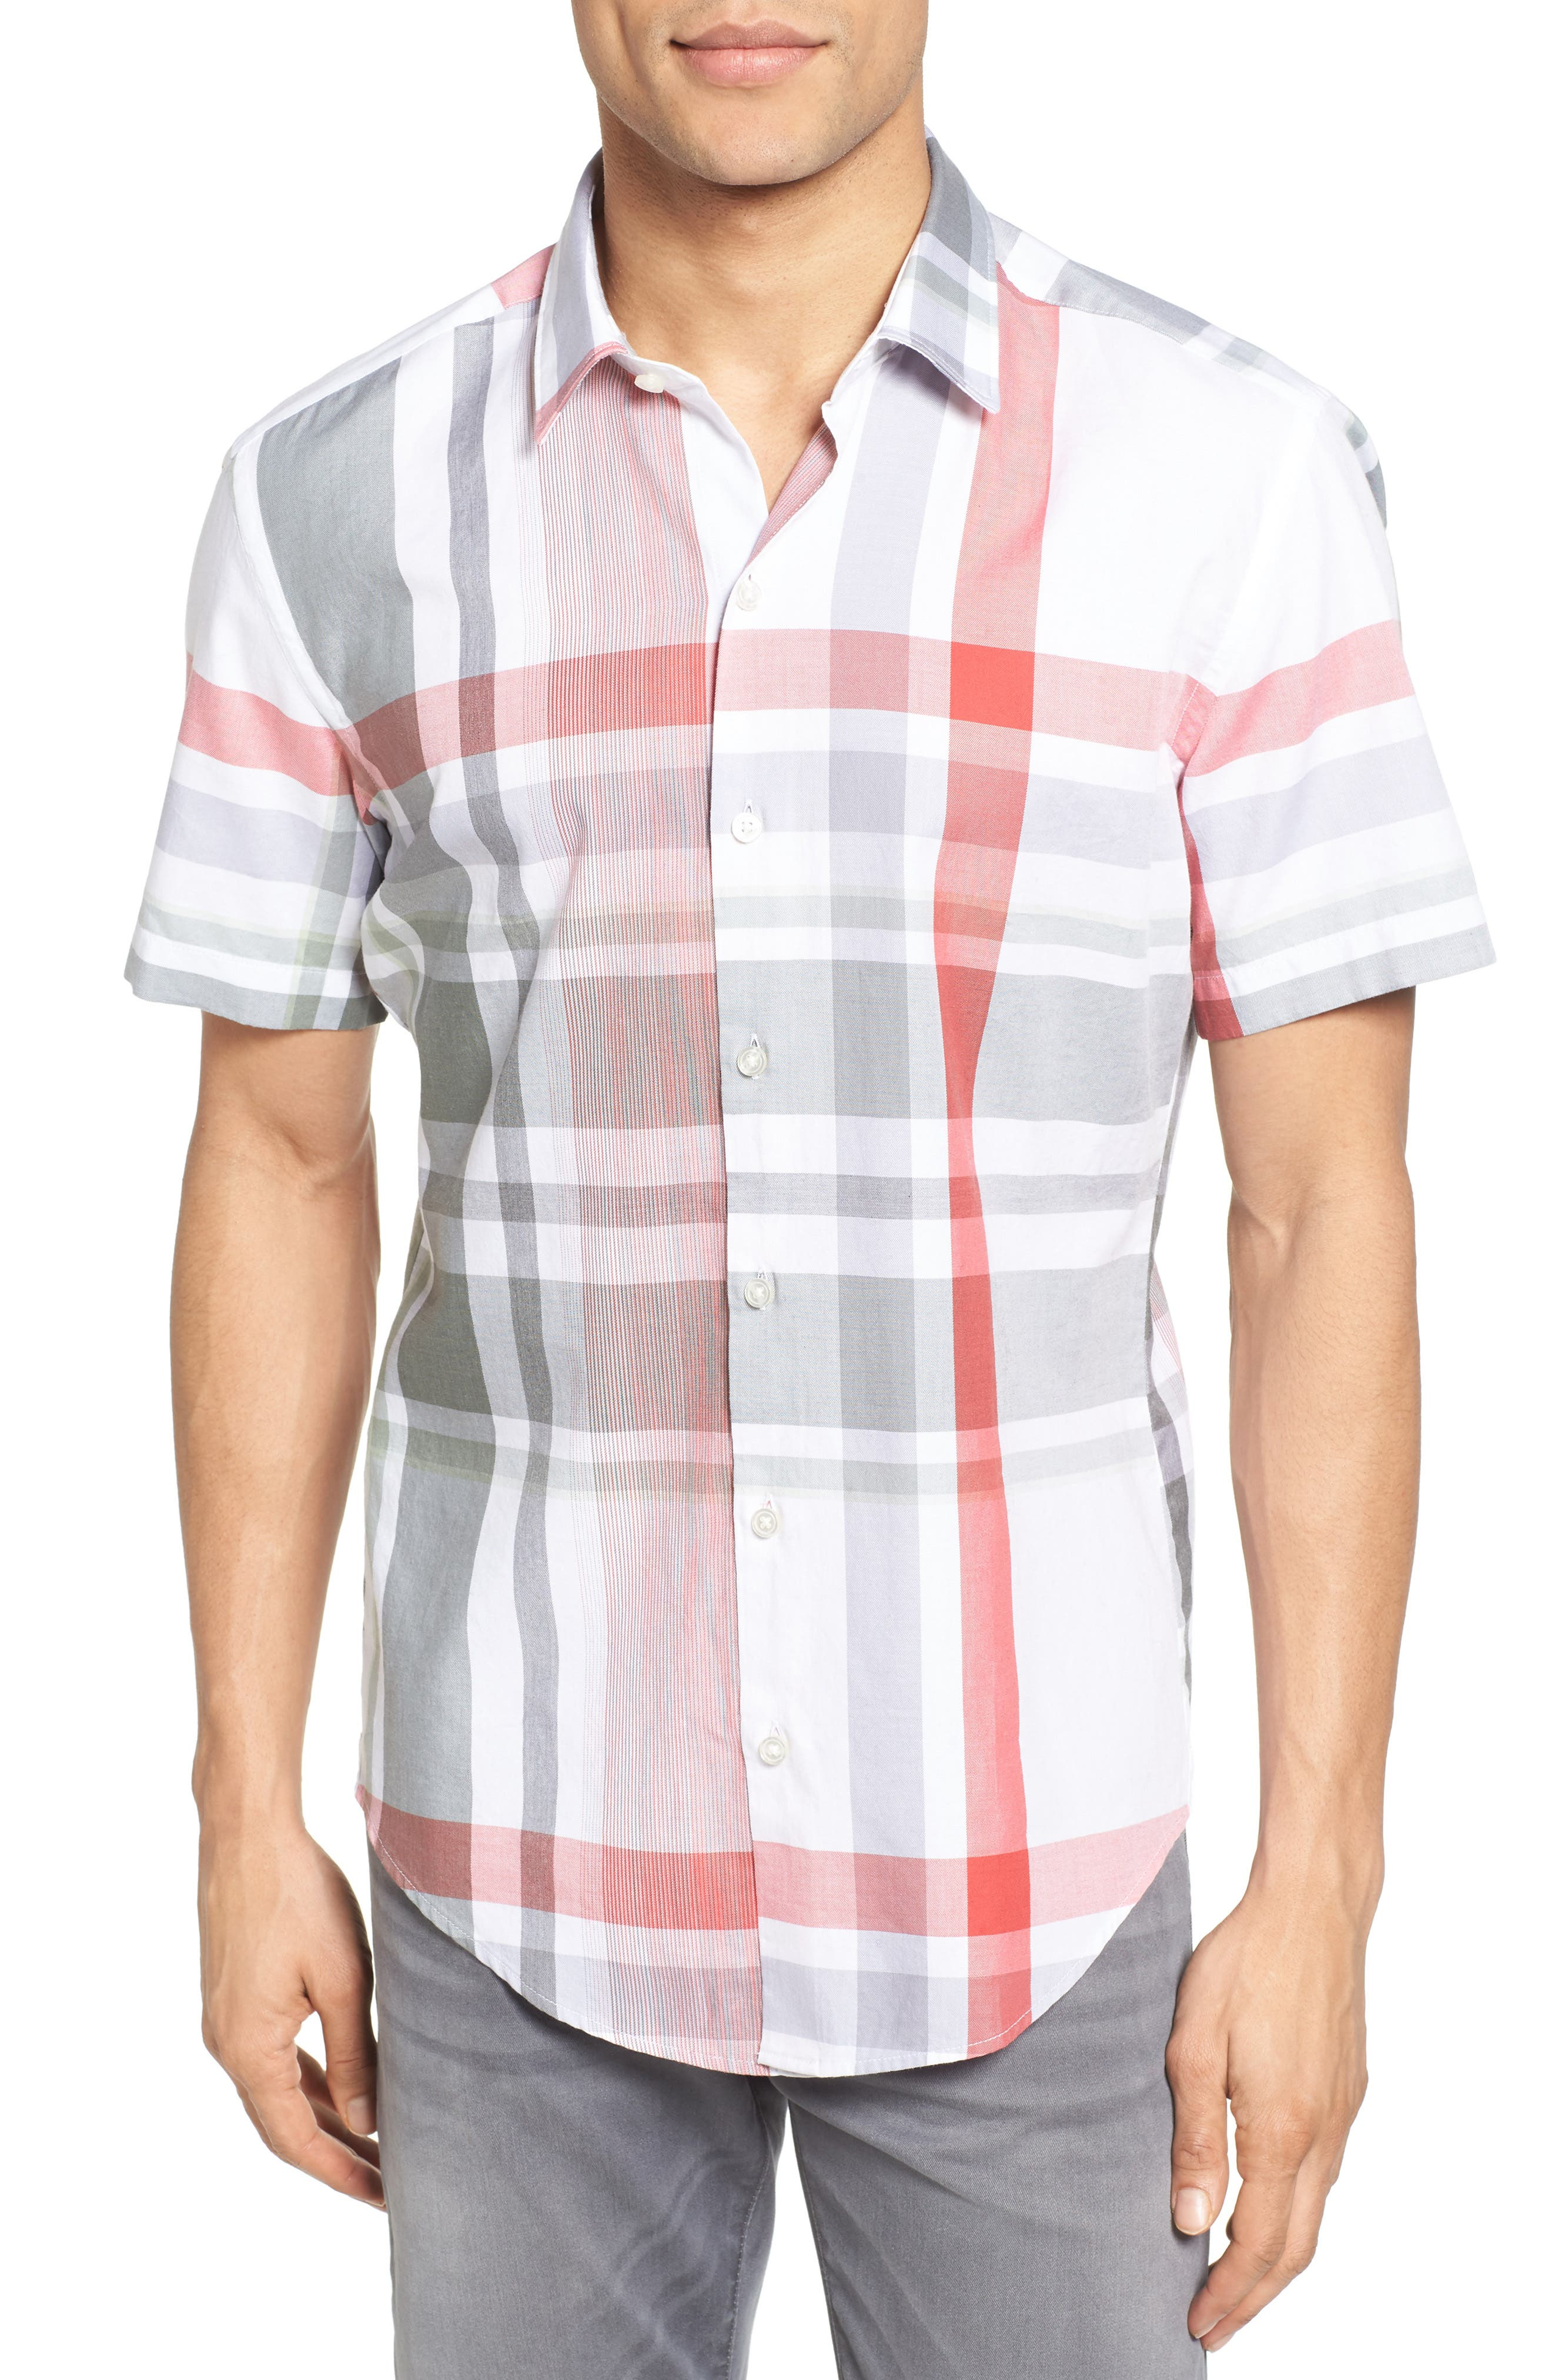 Robb Sharp Fit Plaid Sport Shirt,                             Main thumbnail 1, color,                             602